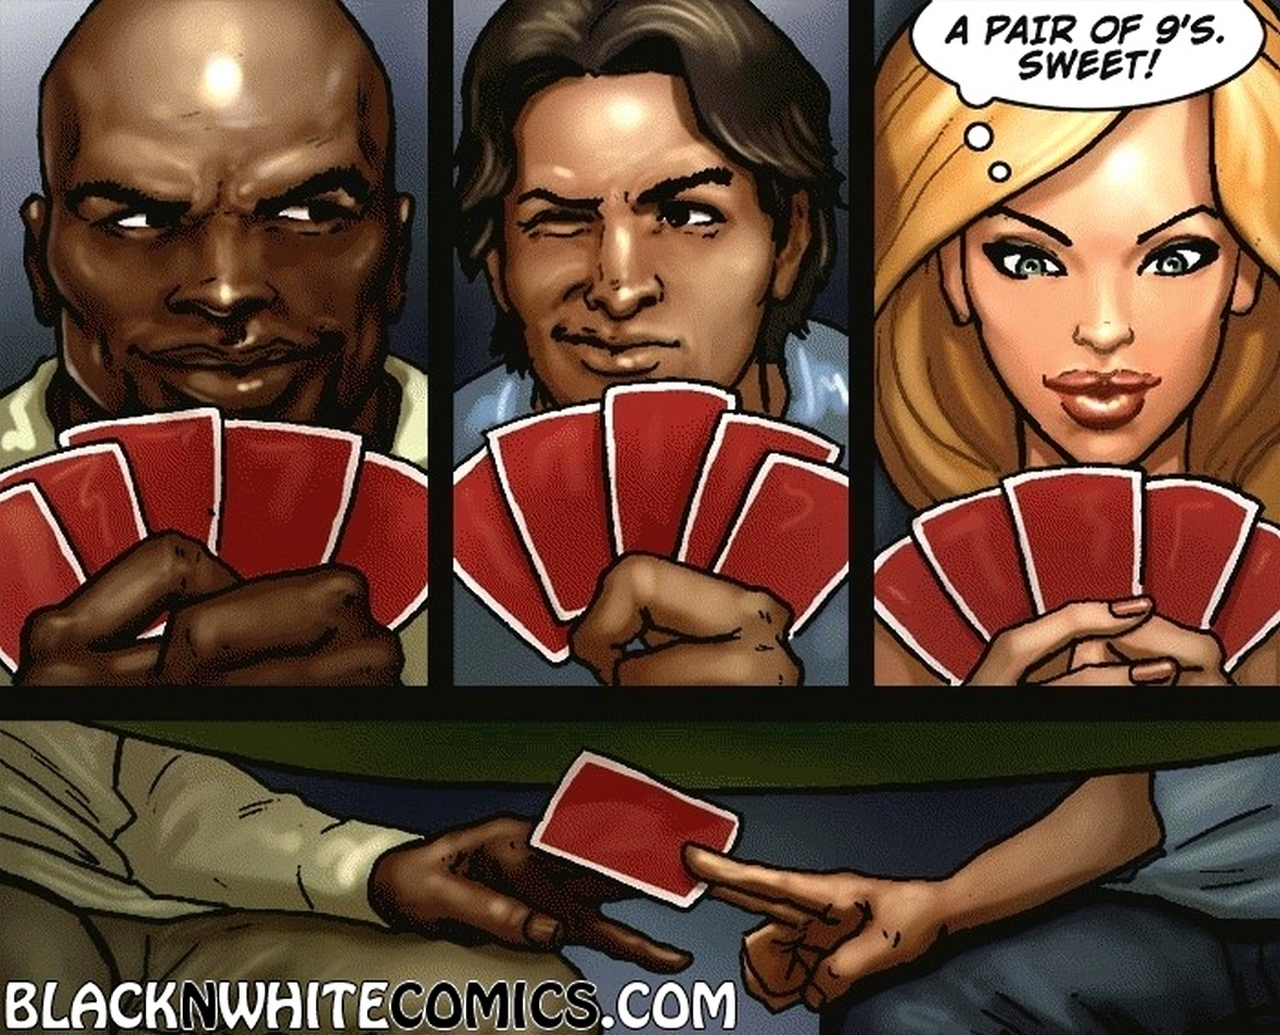 The-Poker-Game-1 16 free sex comic